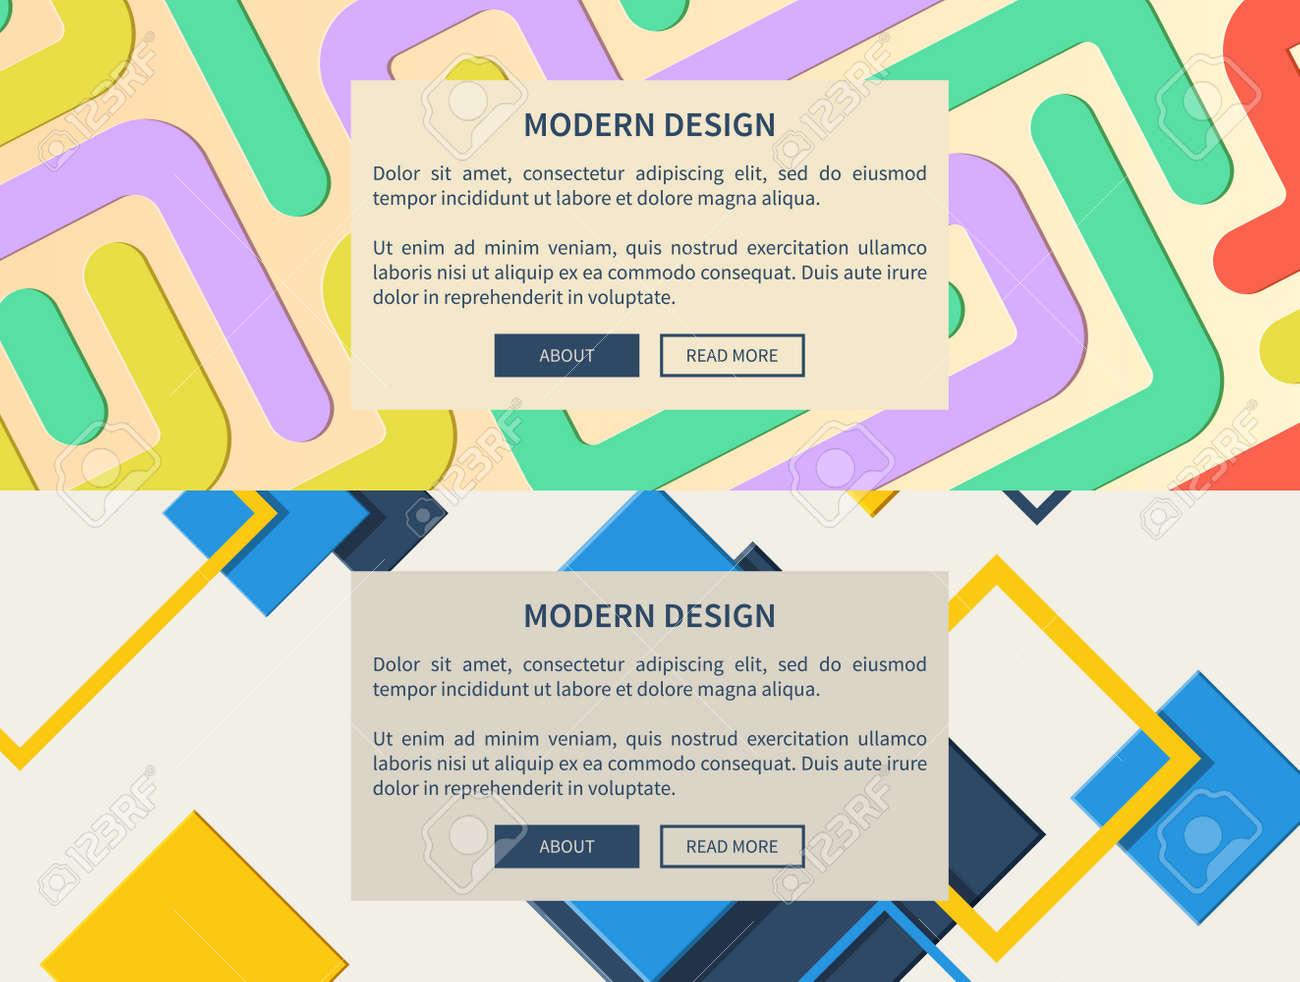 Modern design web pages set of diagonal lines making unity together